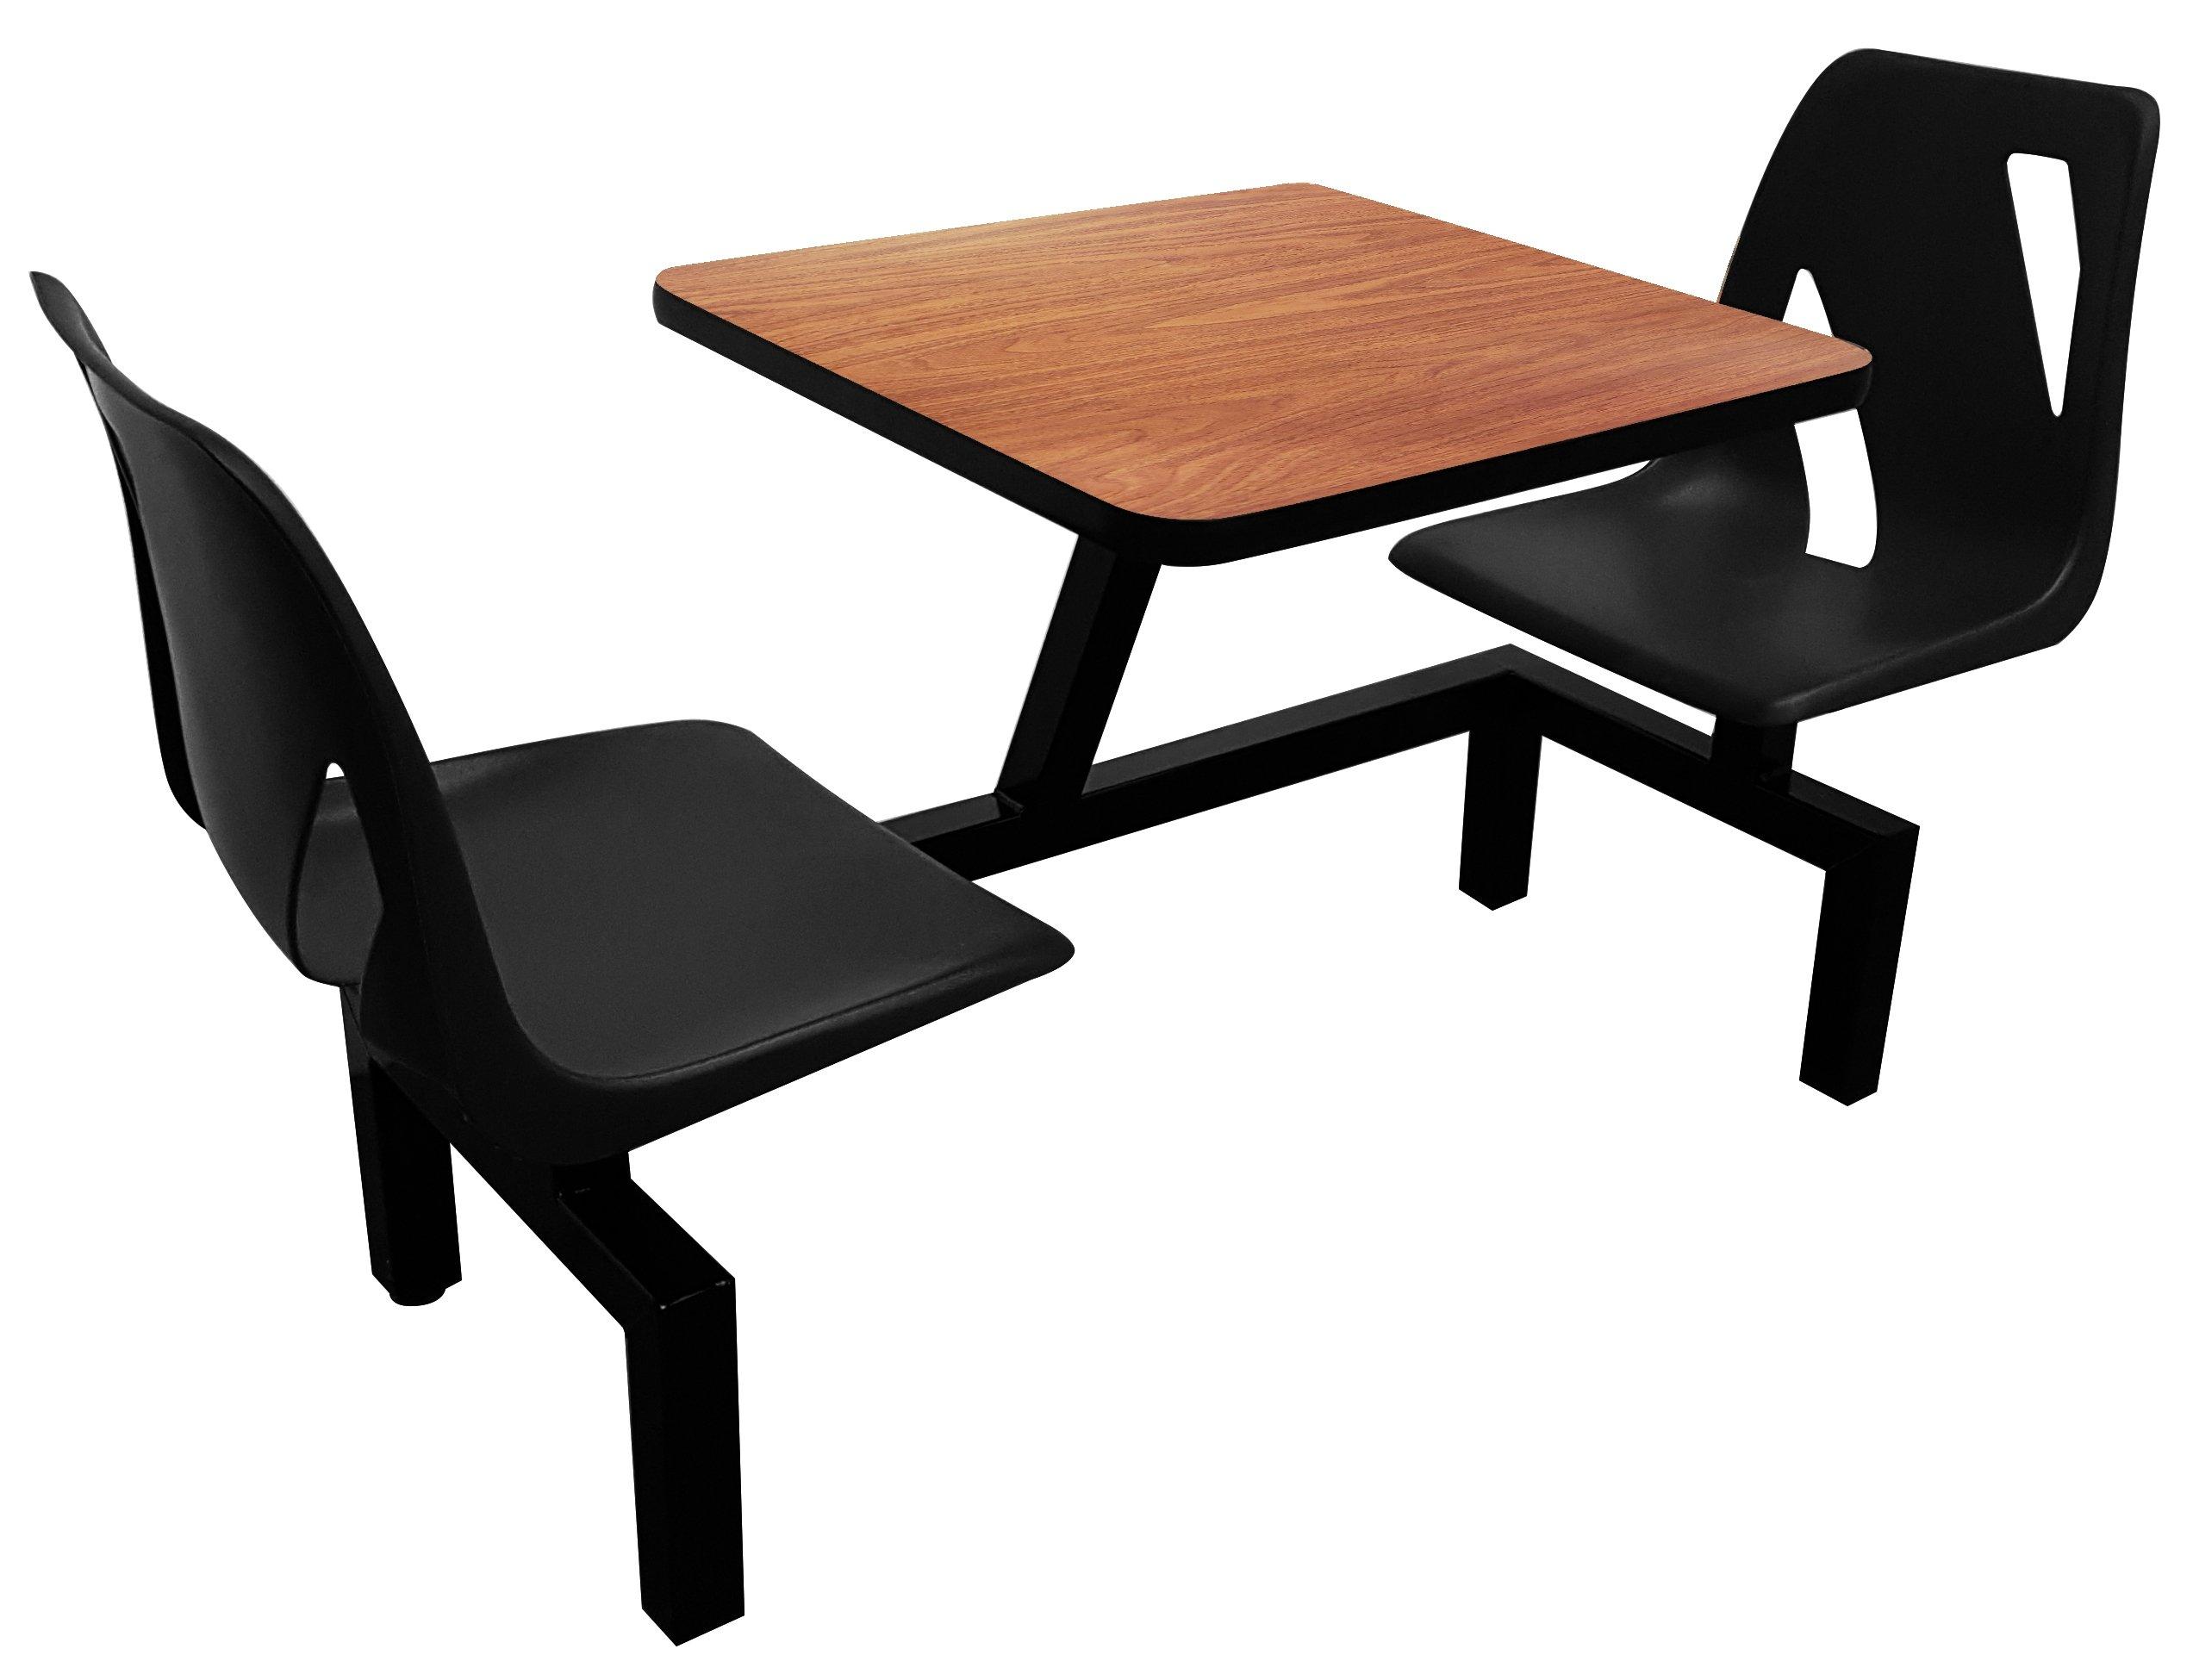 Rodo Industries DS2W-BK-WA DS2W,BK,WA DS Series Public Cluster Modular Seating, Two Seat Wall Units, Black Seat, Walnut Tabletop, 60'' x 24'' x 29''